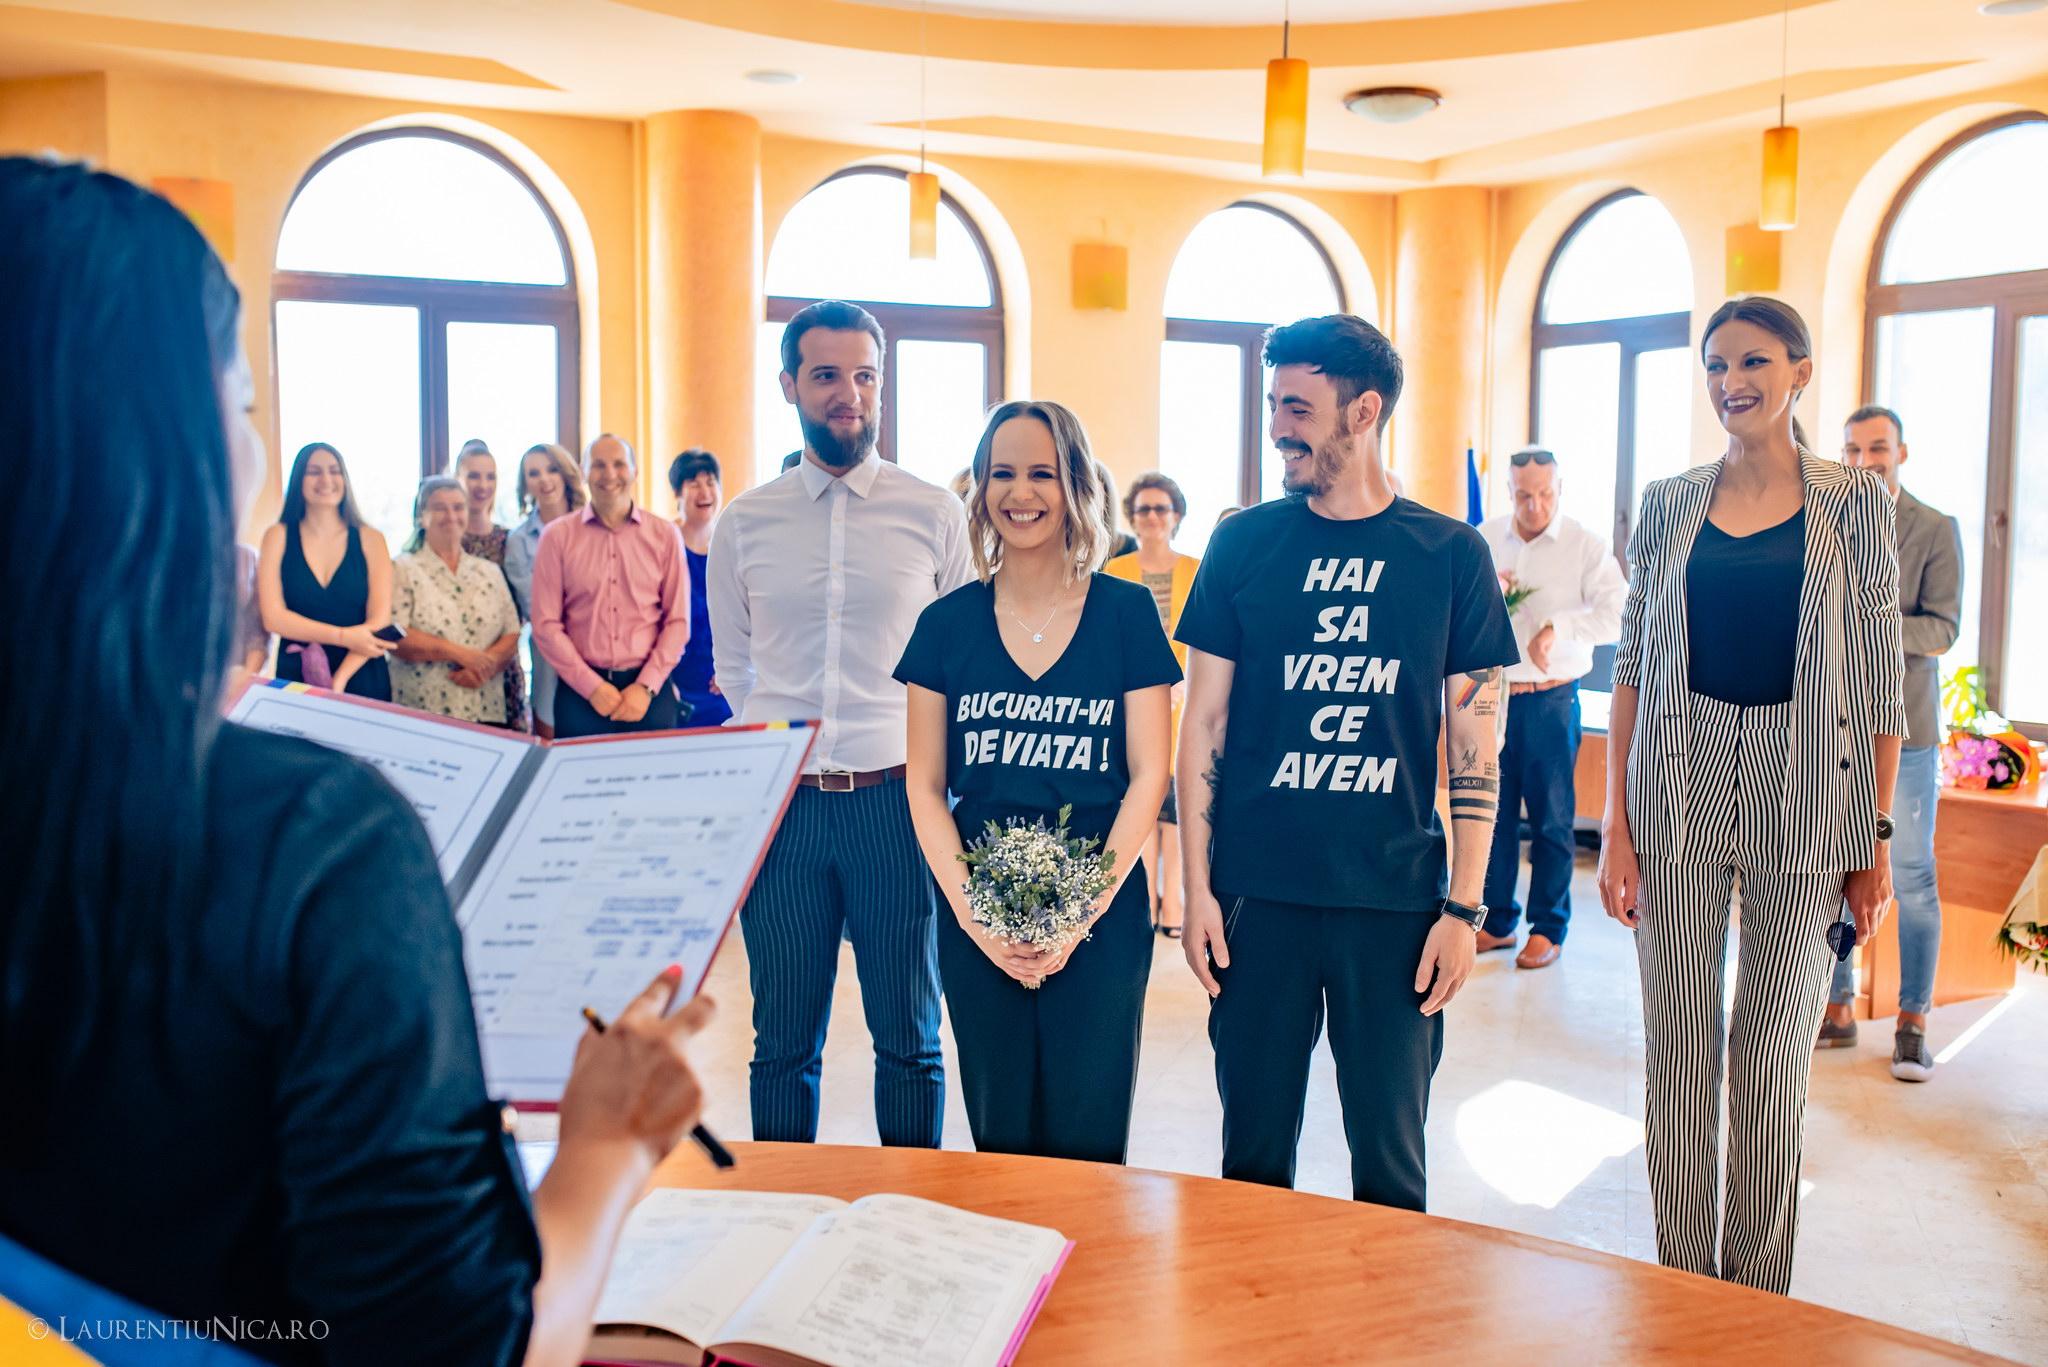 20180915 LN 0012 - Diana & Marius | Fotografii nunta | Slatina